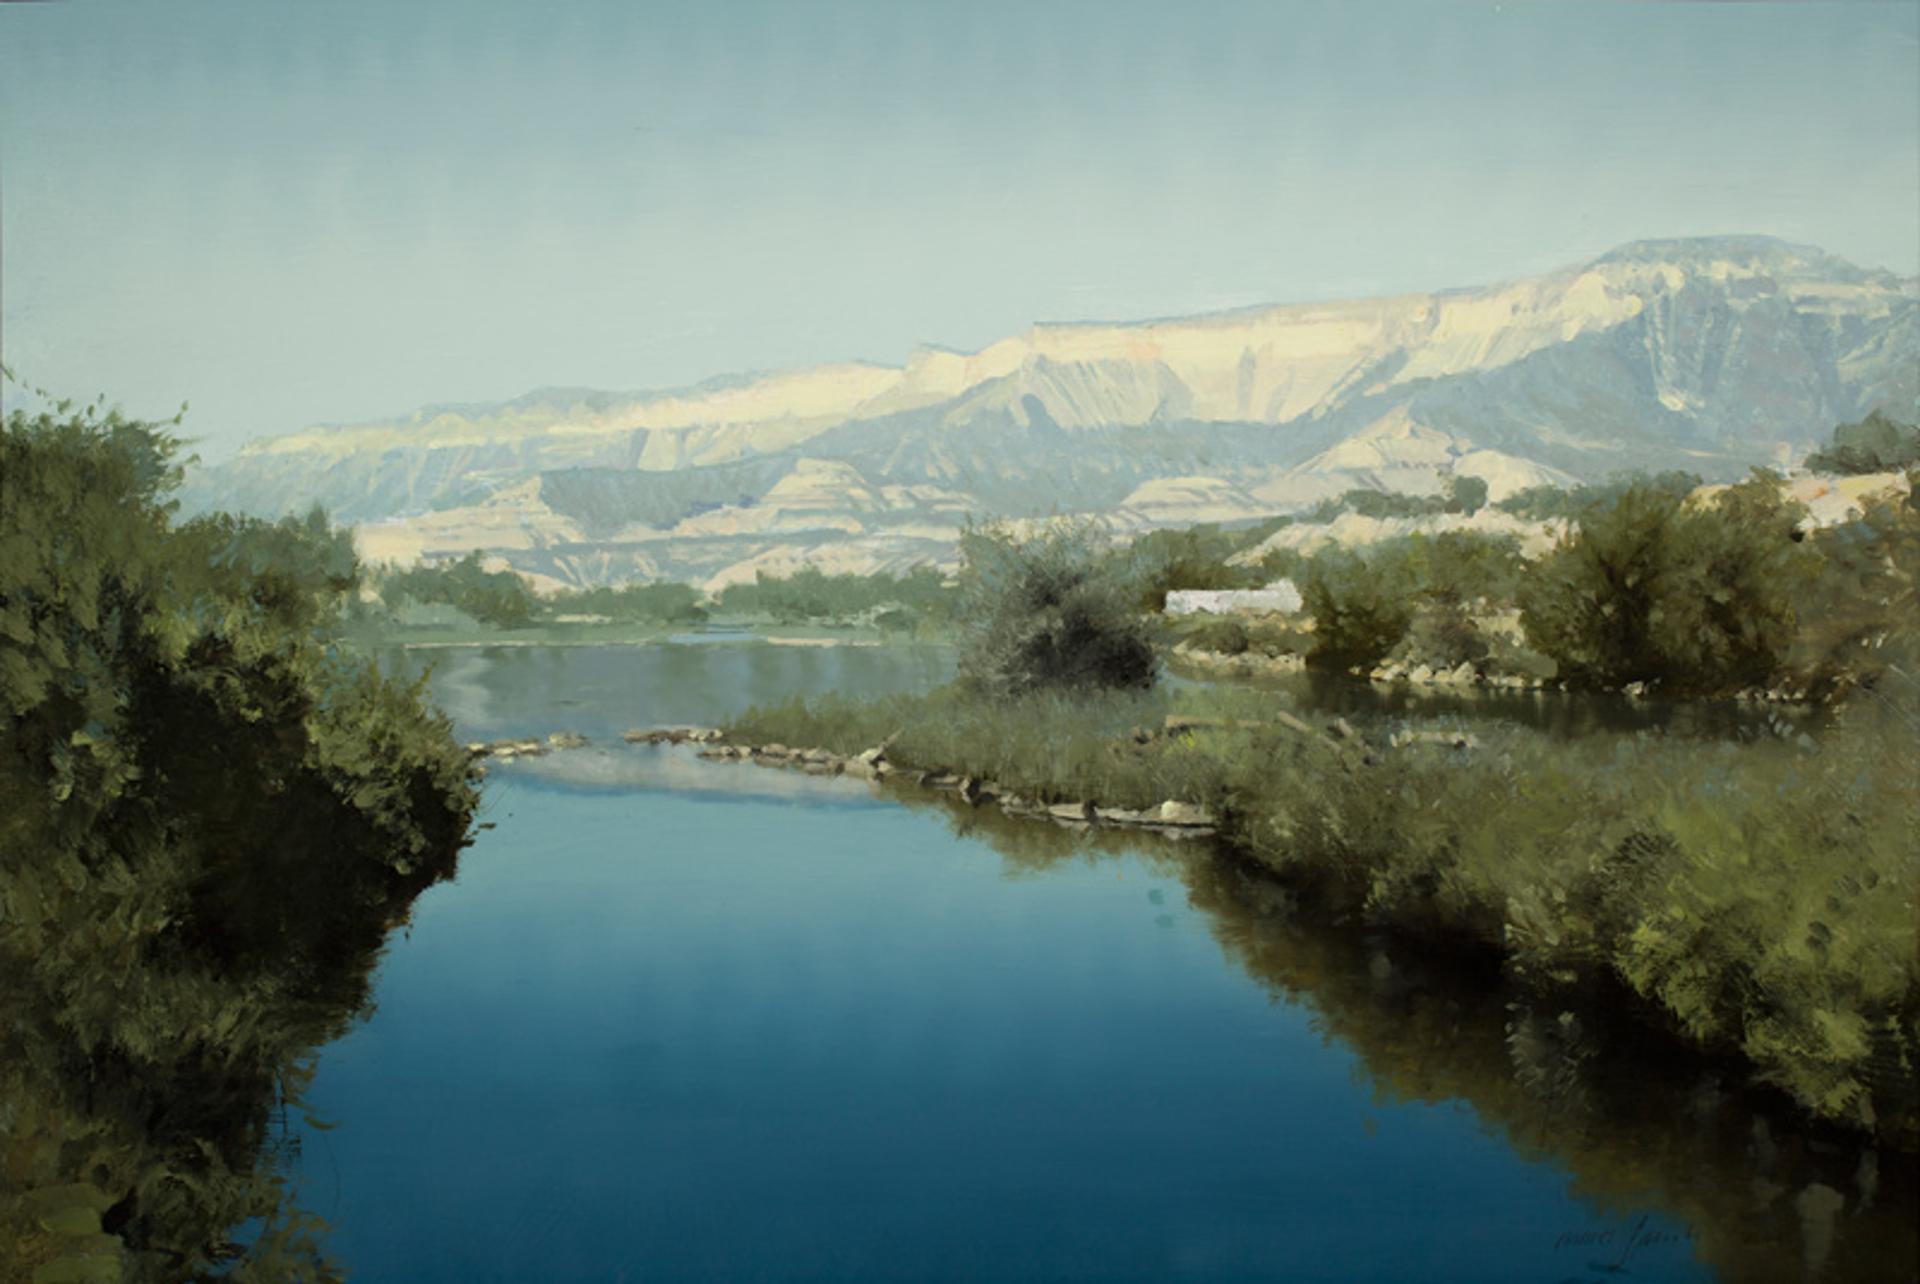 Colorado River near Rifle by Daniel Sprick